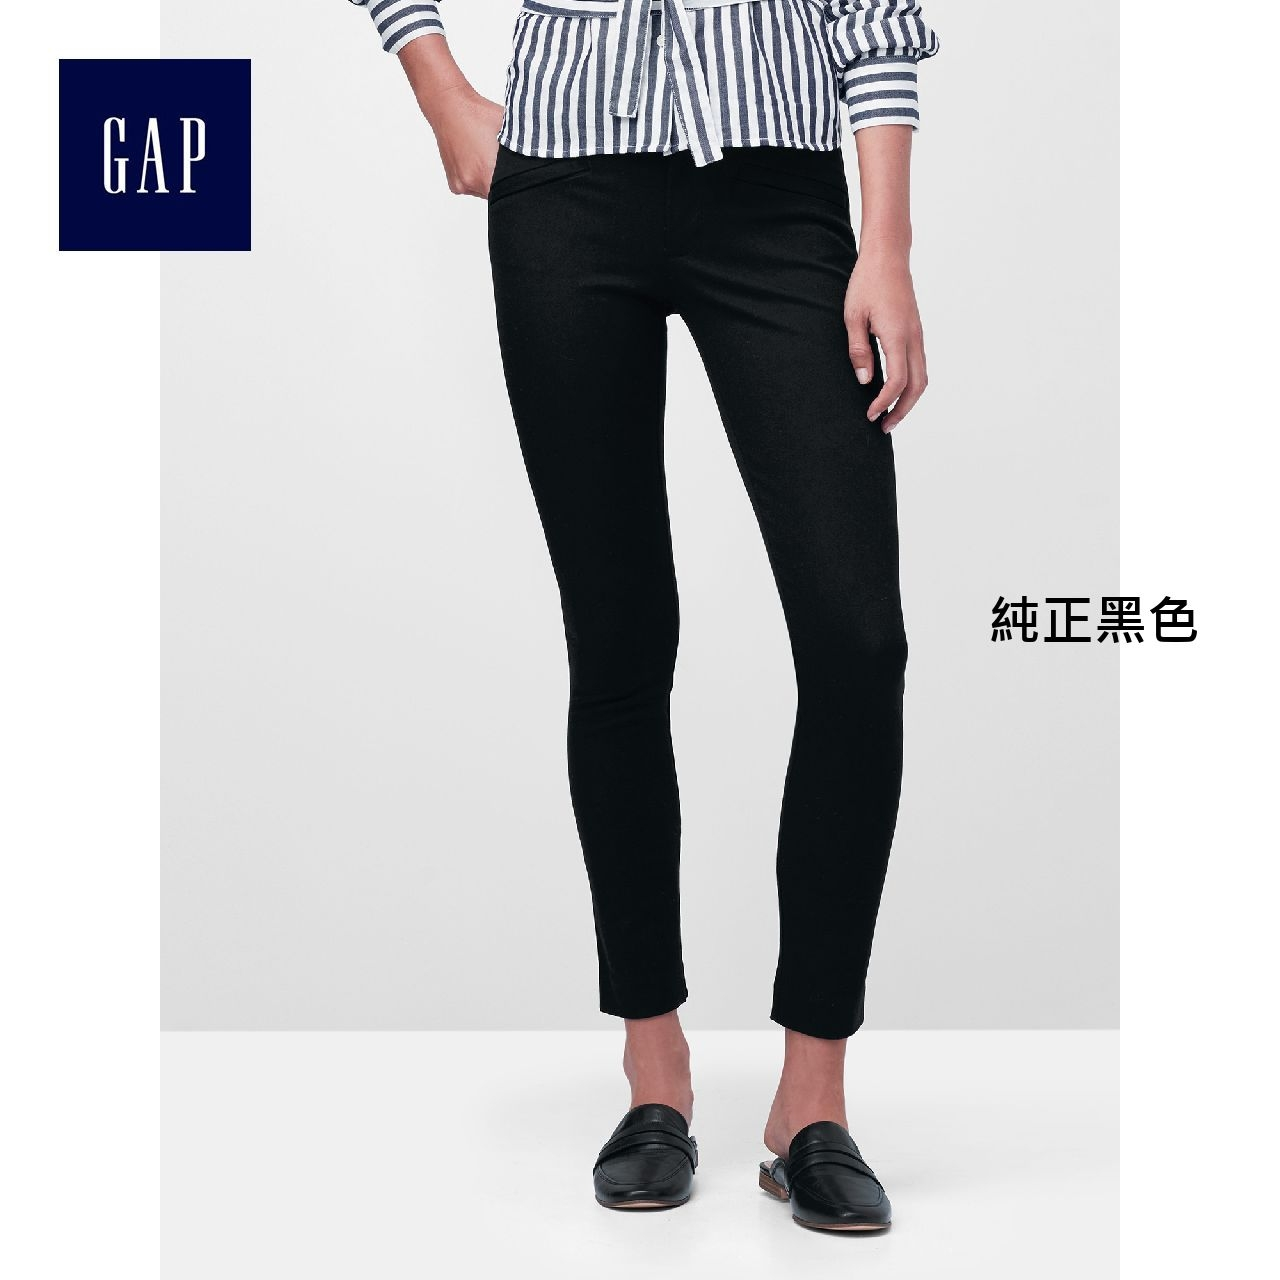 Gap女裝 舒適雙向拉伸緊身九分褲 130046-純正黑色